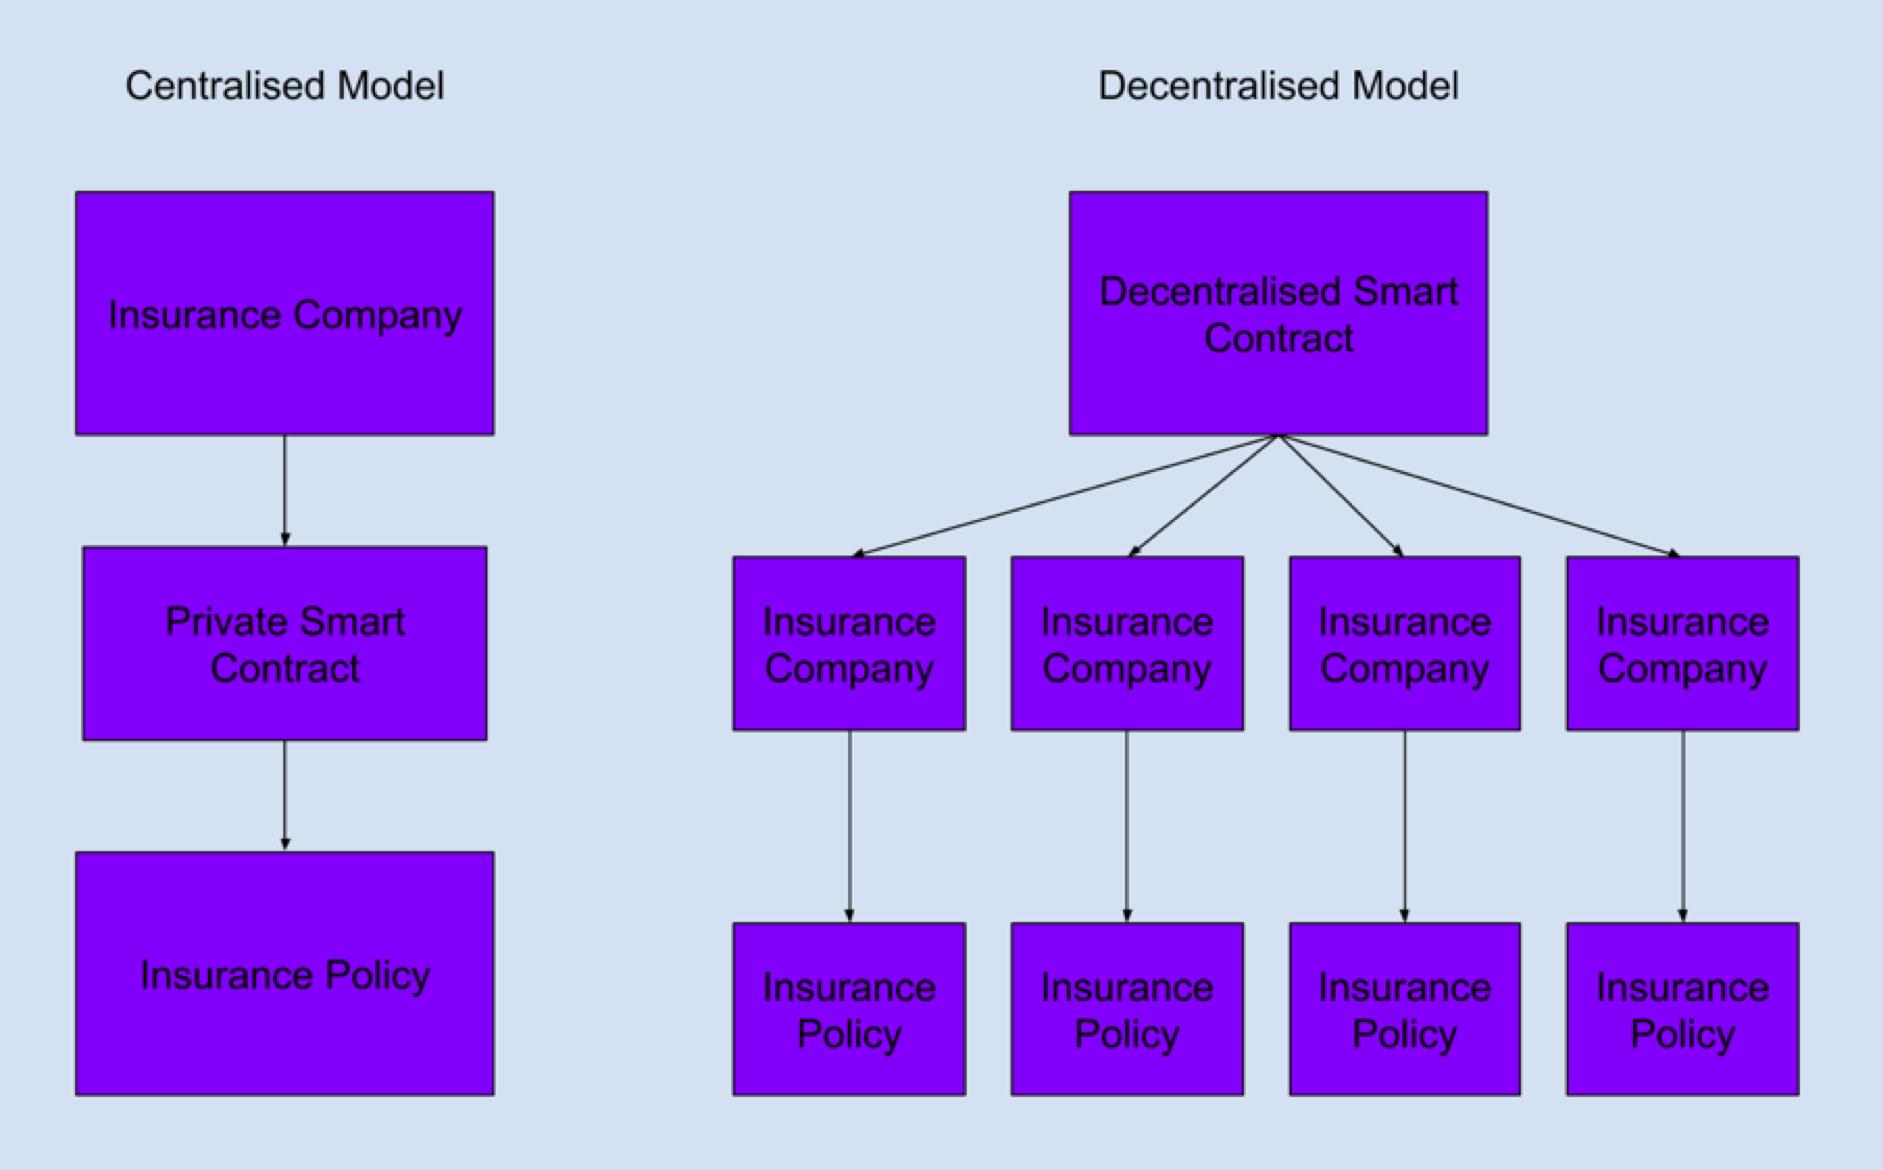 Centralised versus decentralised insurance models, both utilising blockchain